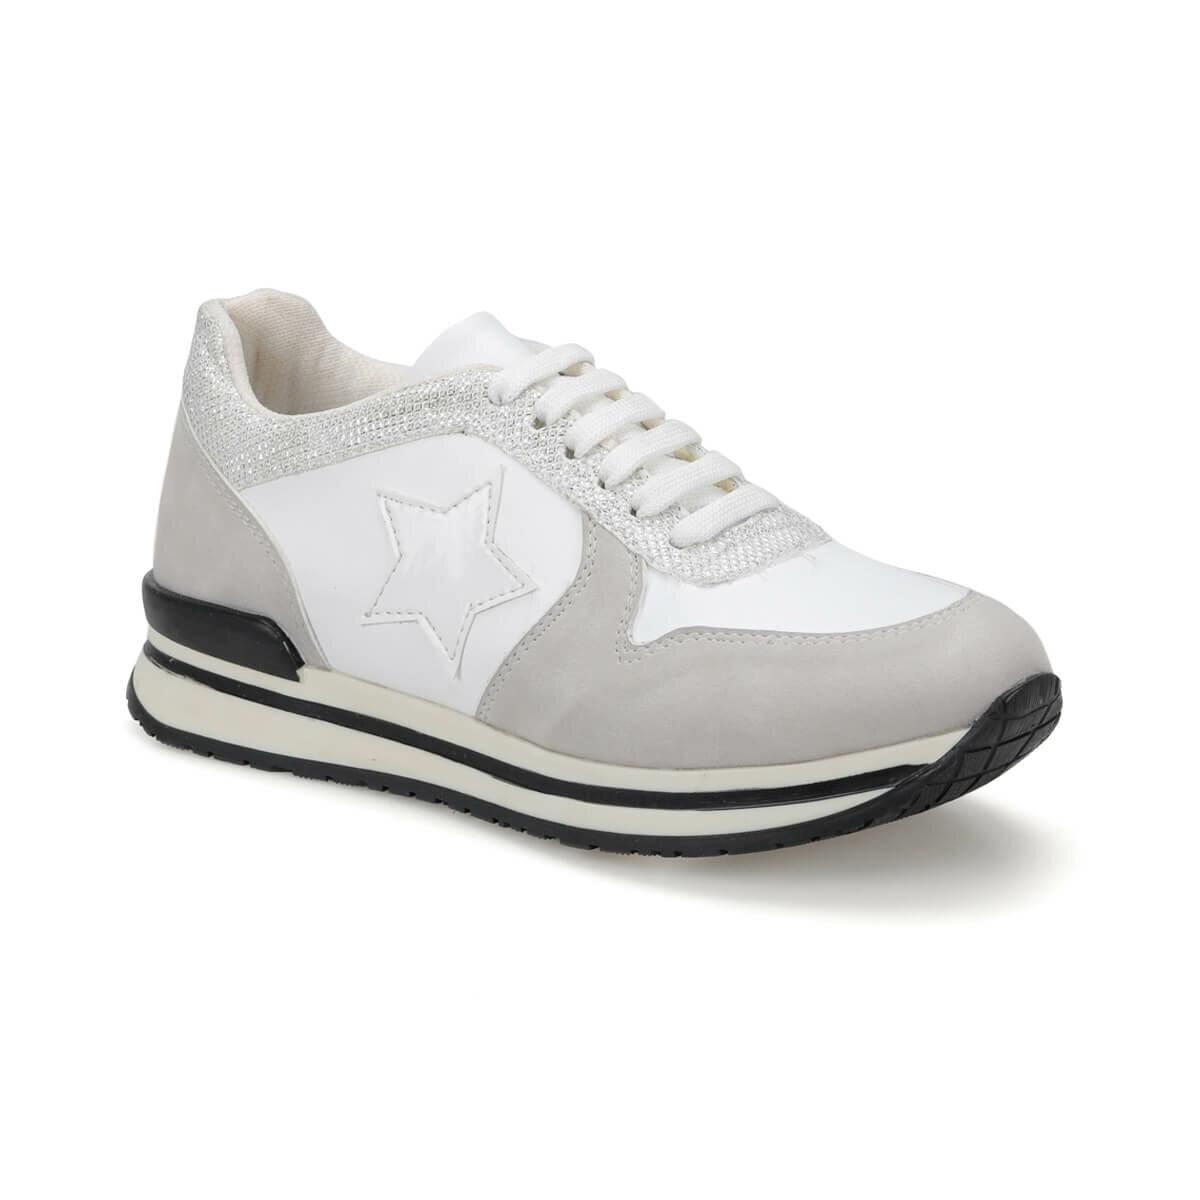 FLO CS19091 Gray Women 'S Sports Shoes Art Bella